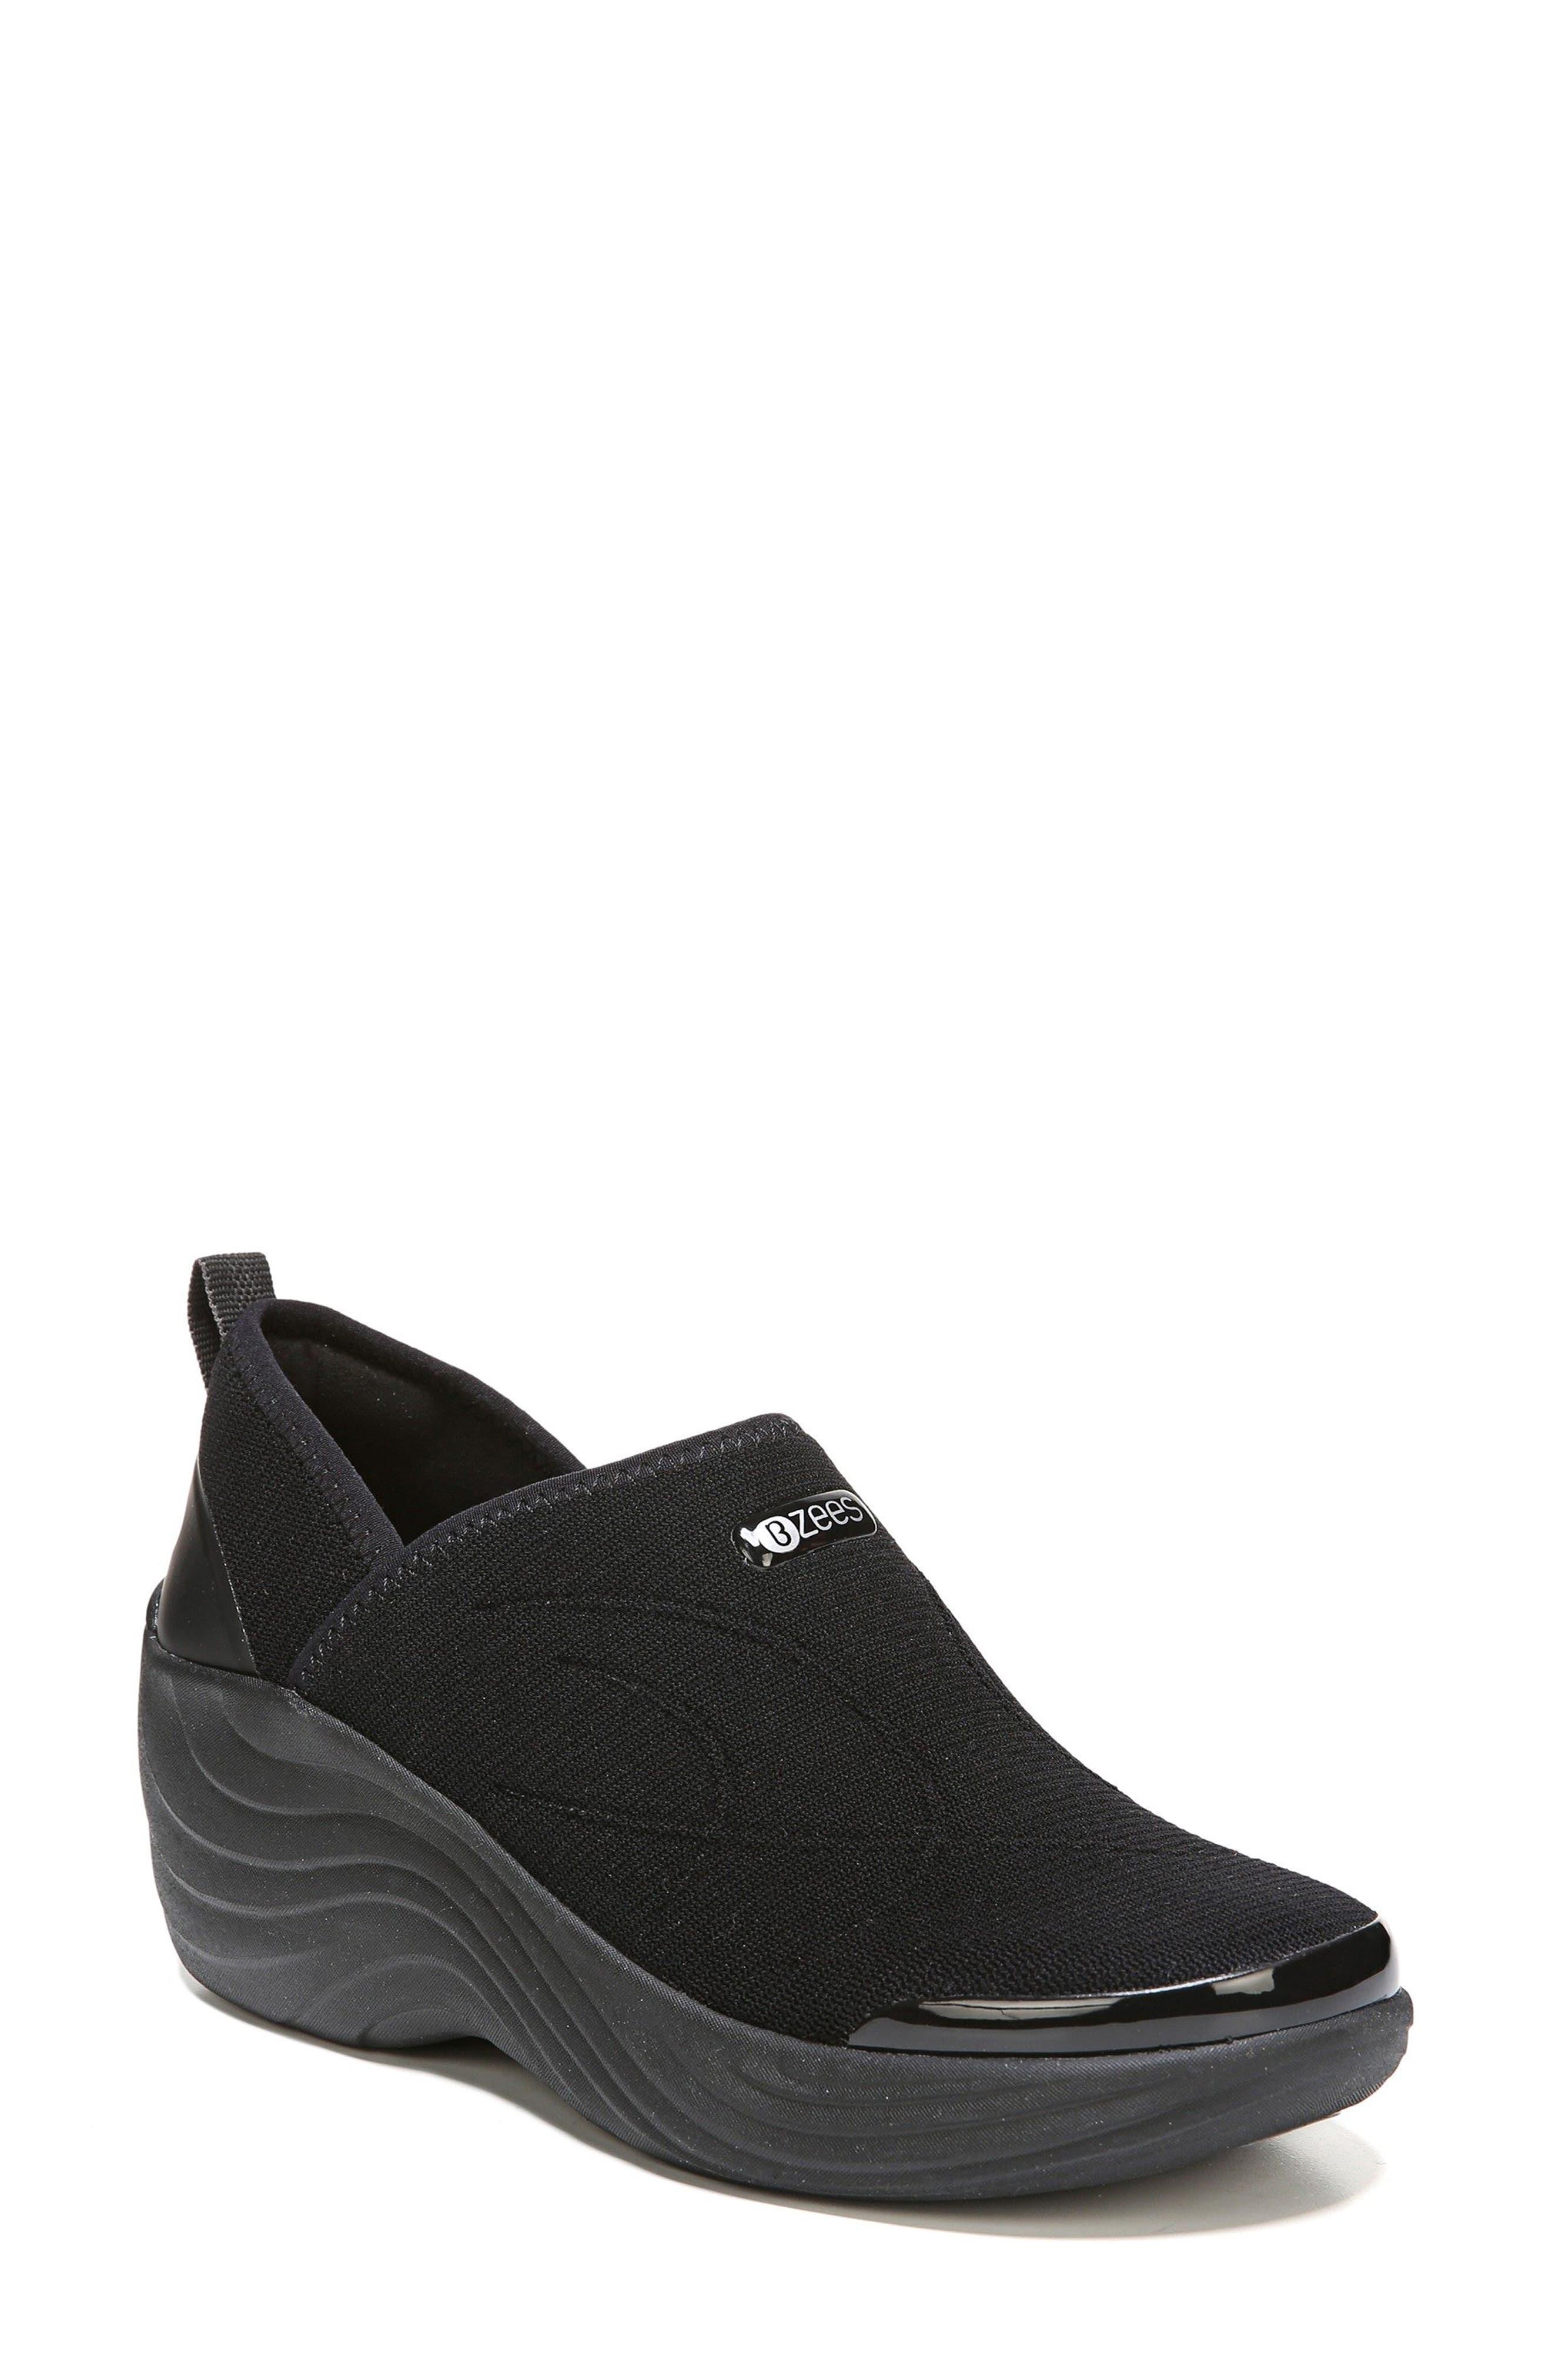 Zsa Zsa Wedge Sneaker,                             Main thumbnail 1, color,                             BLACK FABRIC